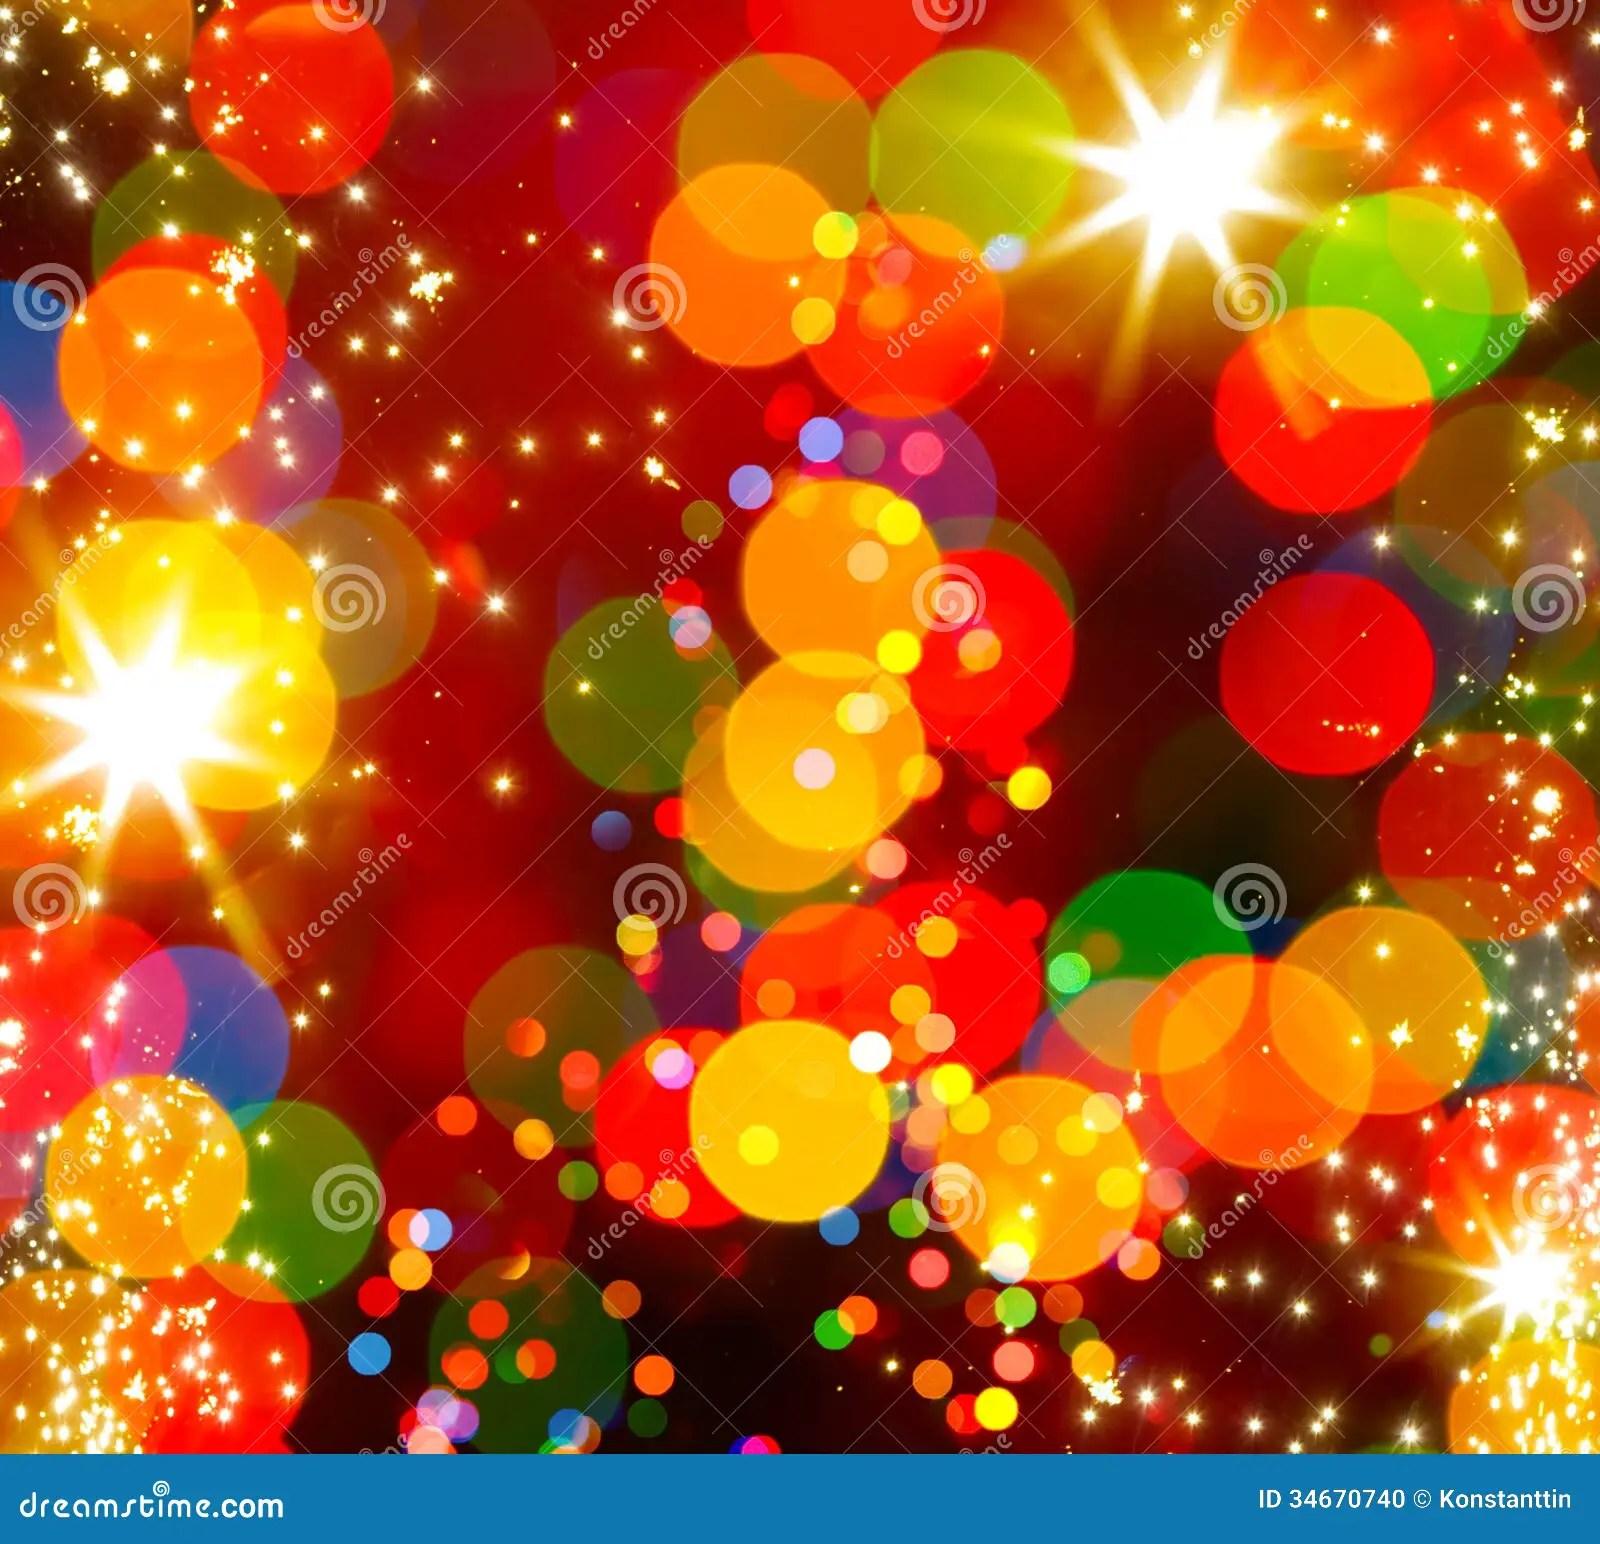 Hd Wallpaper Diwali Light Abstract Christmas Tree Light Background Stock Photo